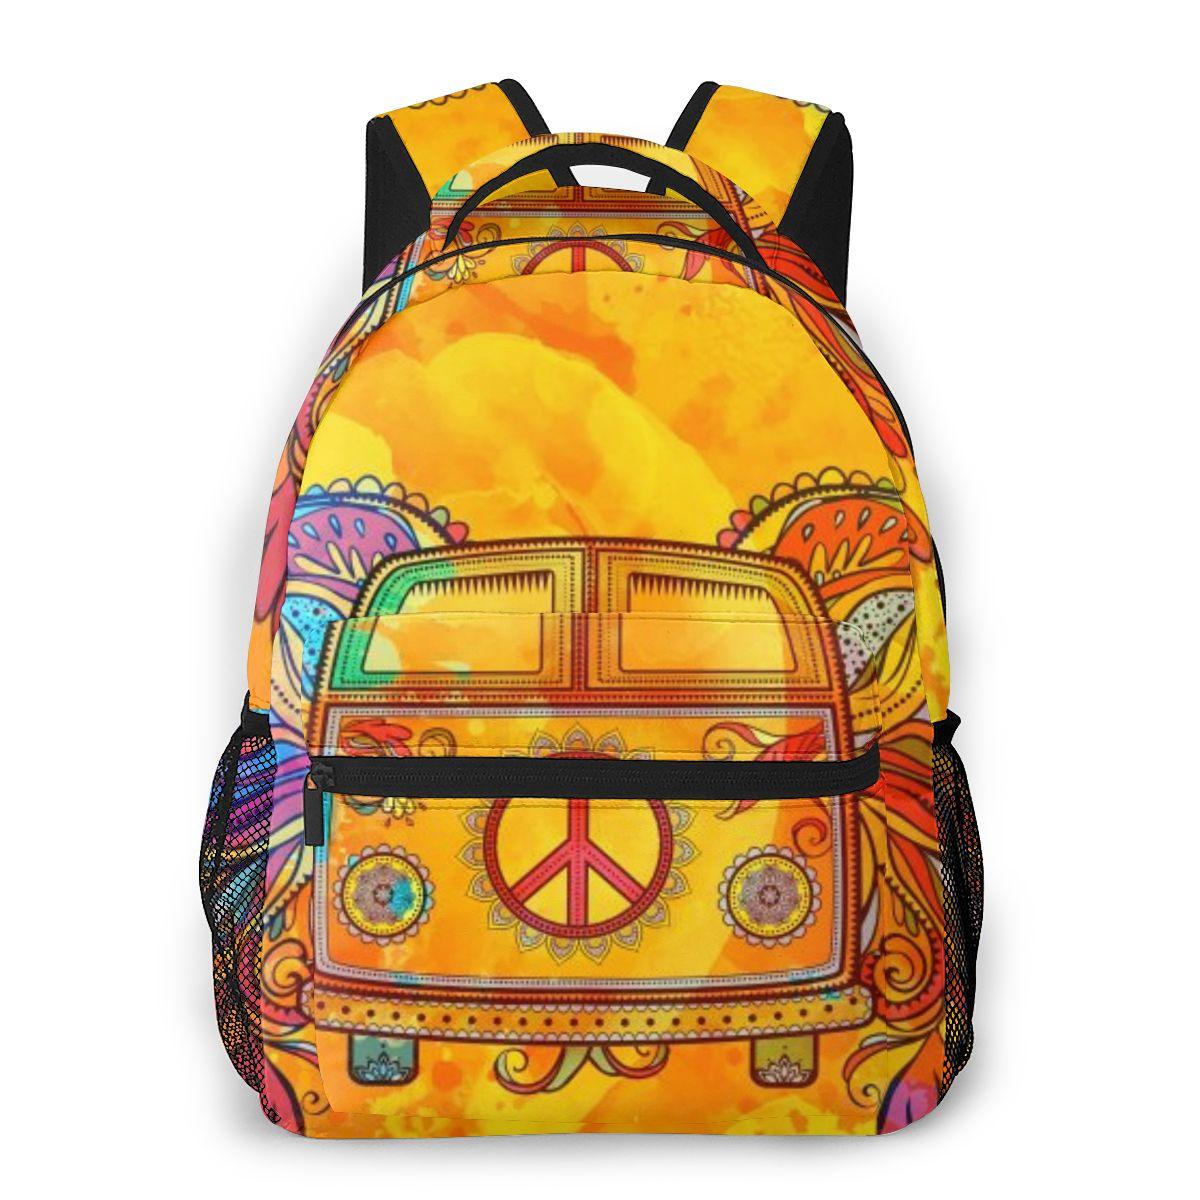 2020 mochila para mujer, Hippie bolso de hombro para coche, Mini Van Retro 1960s Love, bolso escolar de moda para adolescentes, mochilas, bolso de viaje